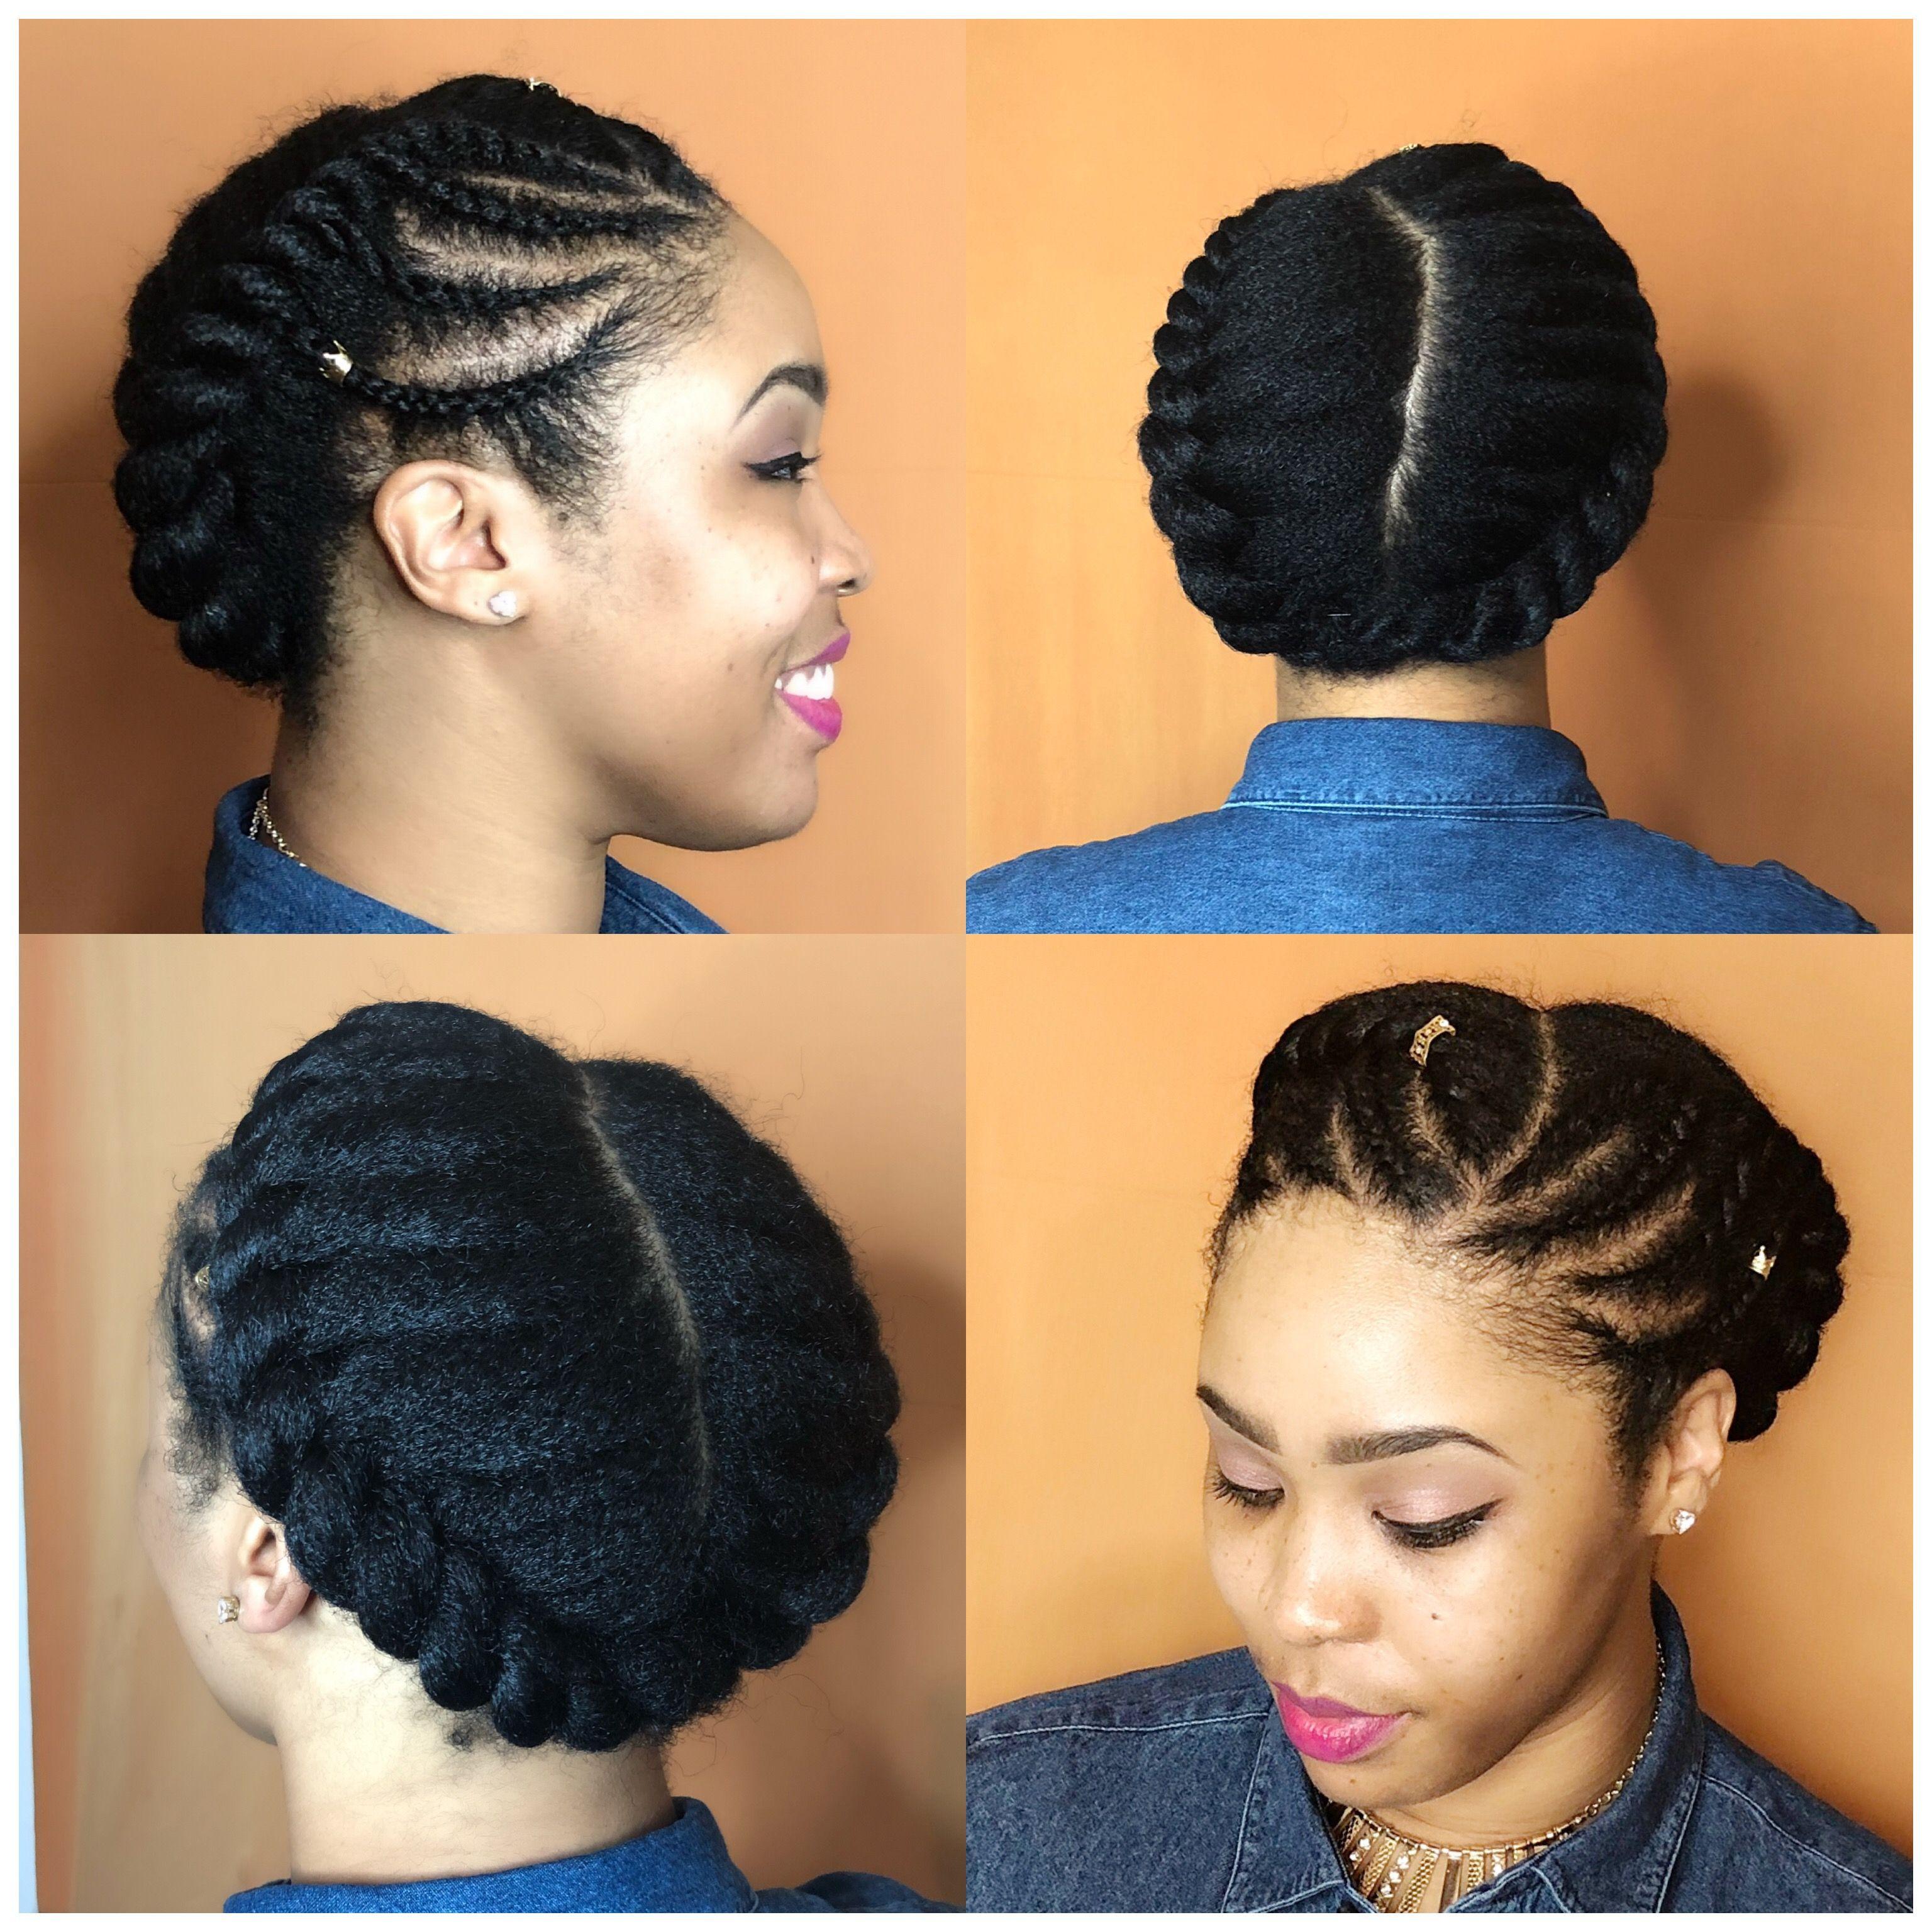 LoveLeyshair flat twist braids 4c hairstyles 4c protective